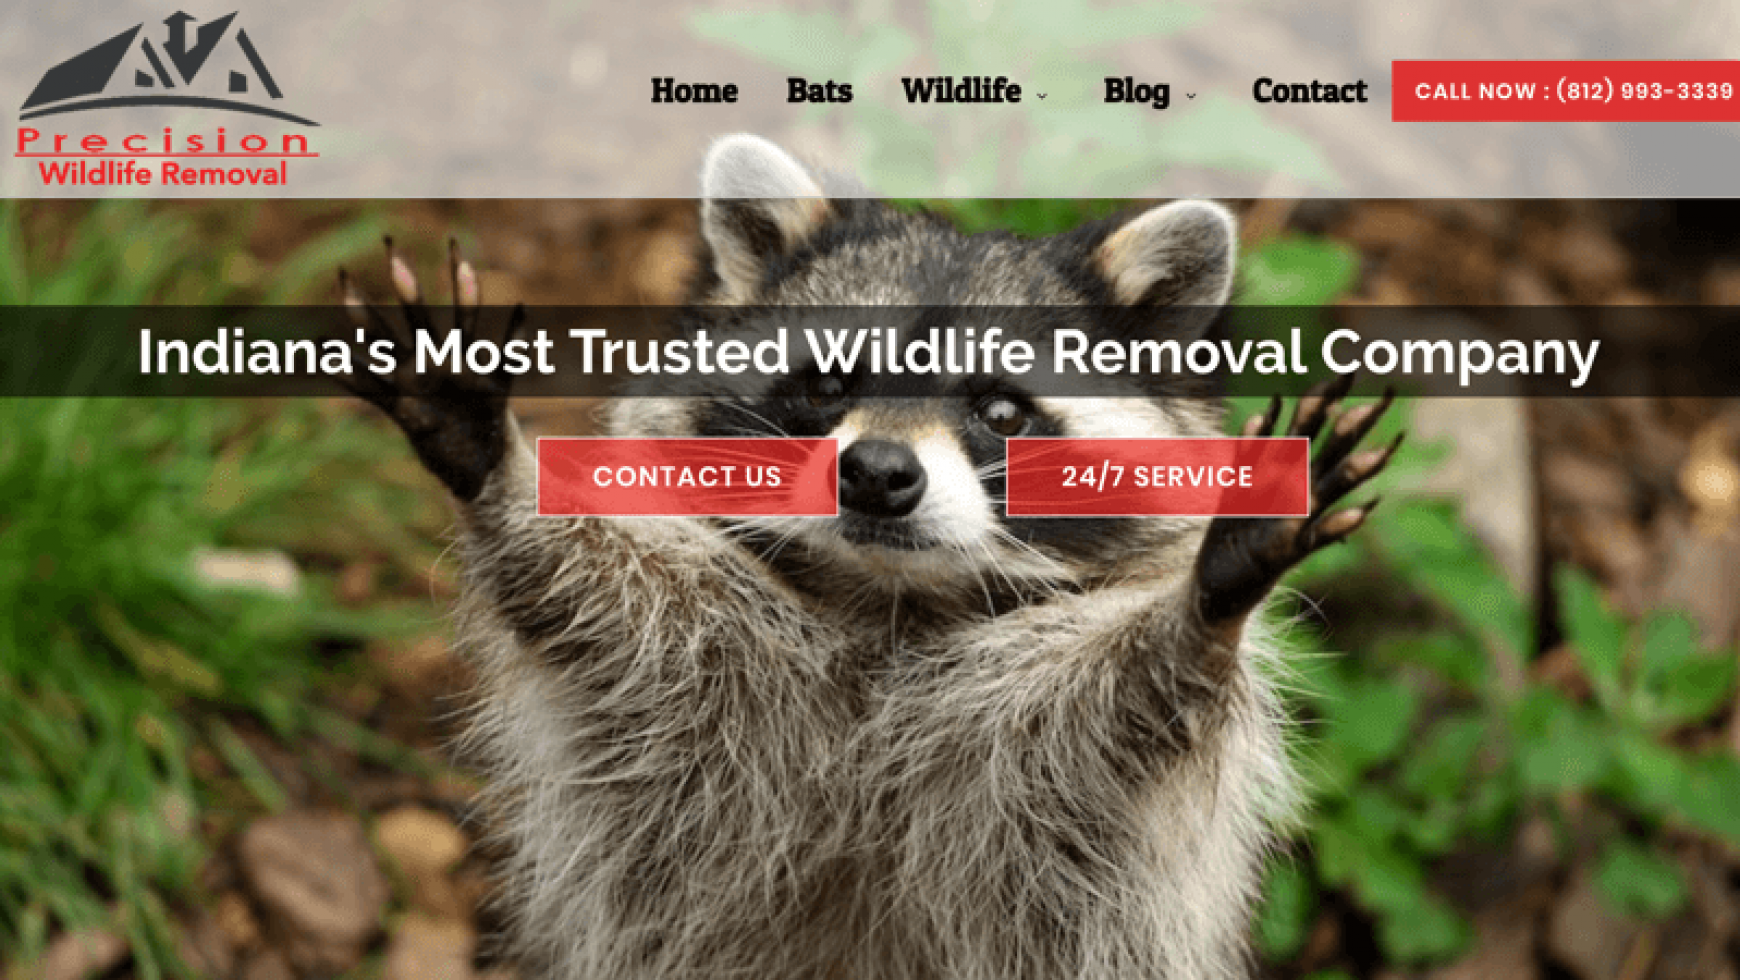 Precision Wildlife Removal Website – Indiana